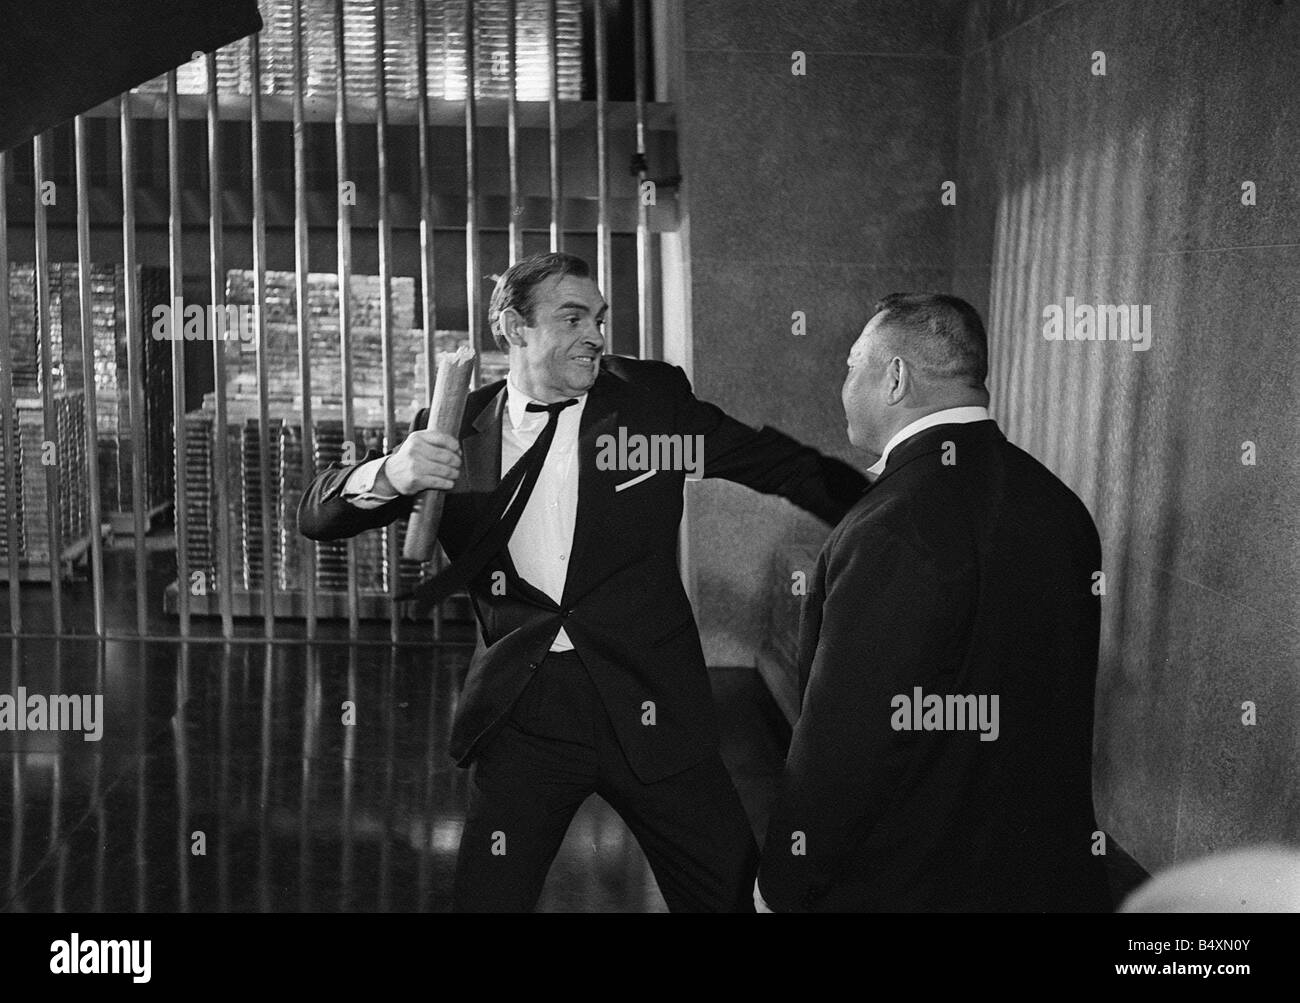 http://c8.alamy.com/comp/B4XN0Y/film-goldfinger-1964-sean-connery-as-james-bond-007-fighting-with-B4XN0Y.jpg